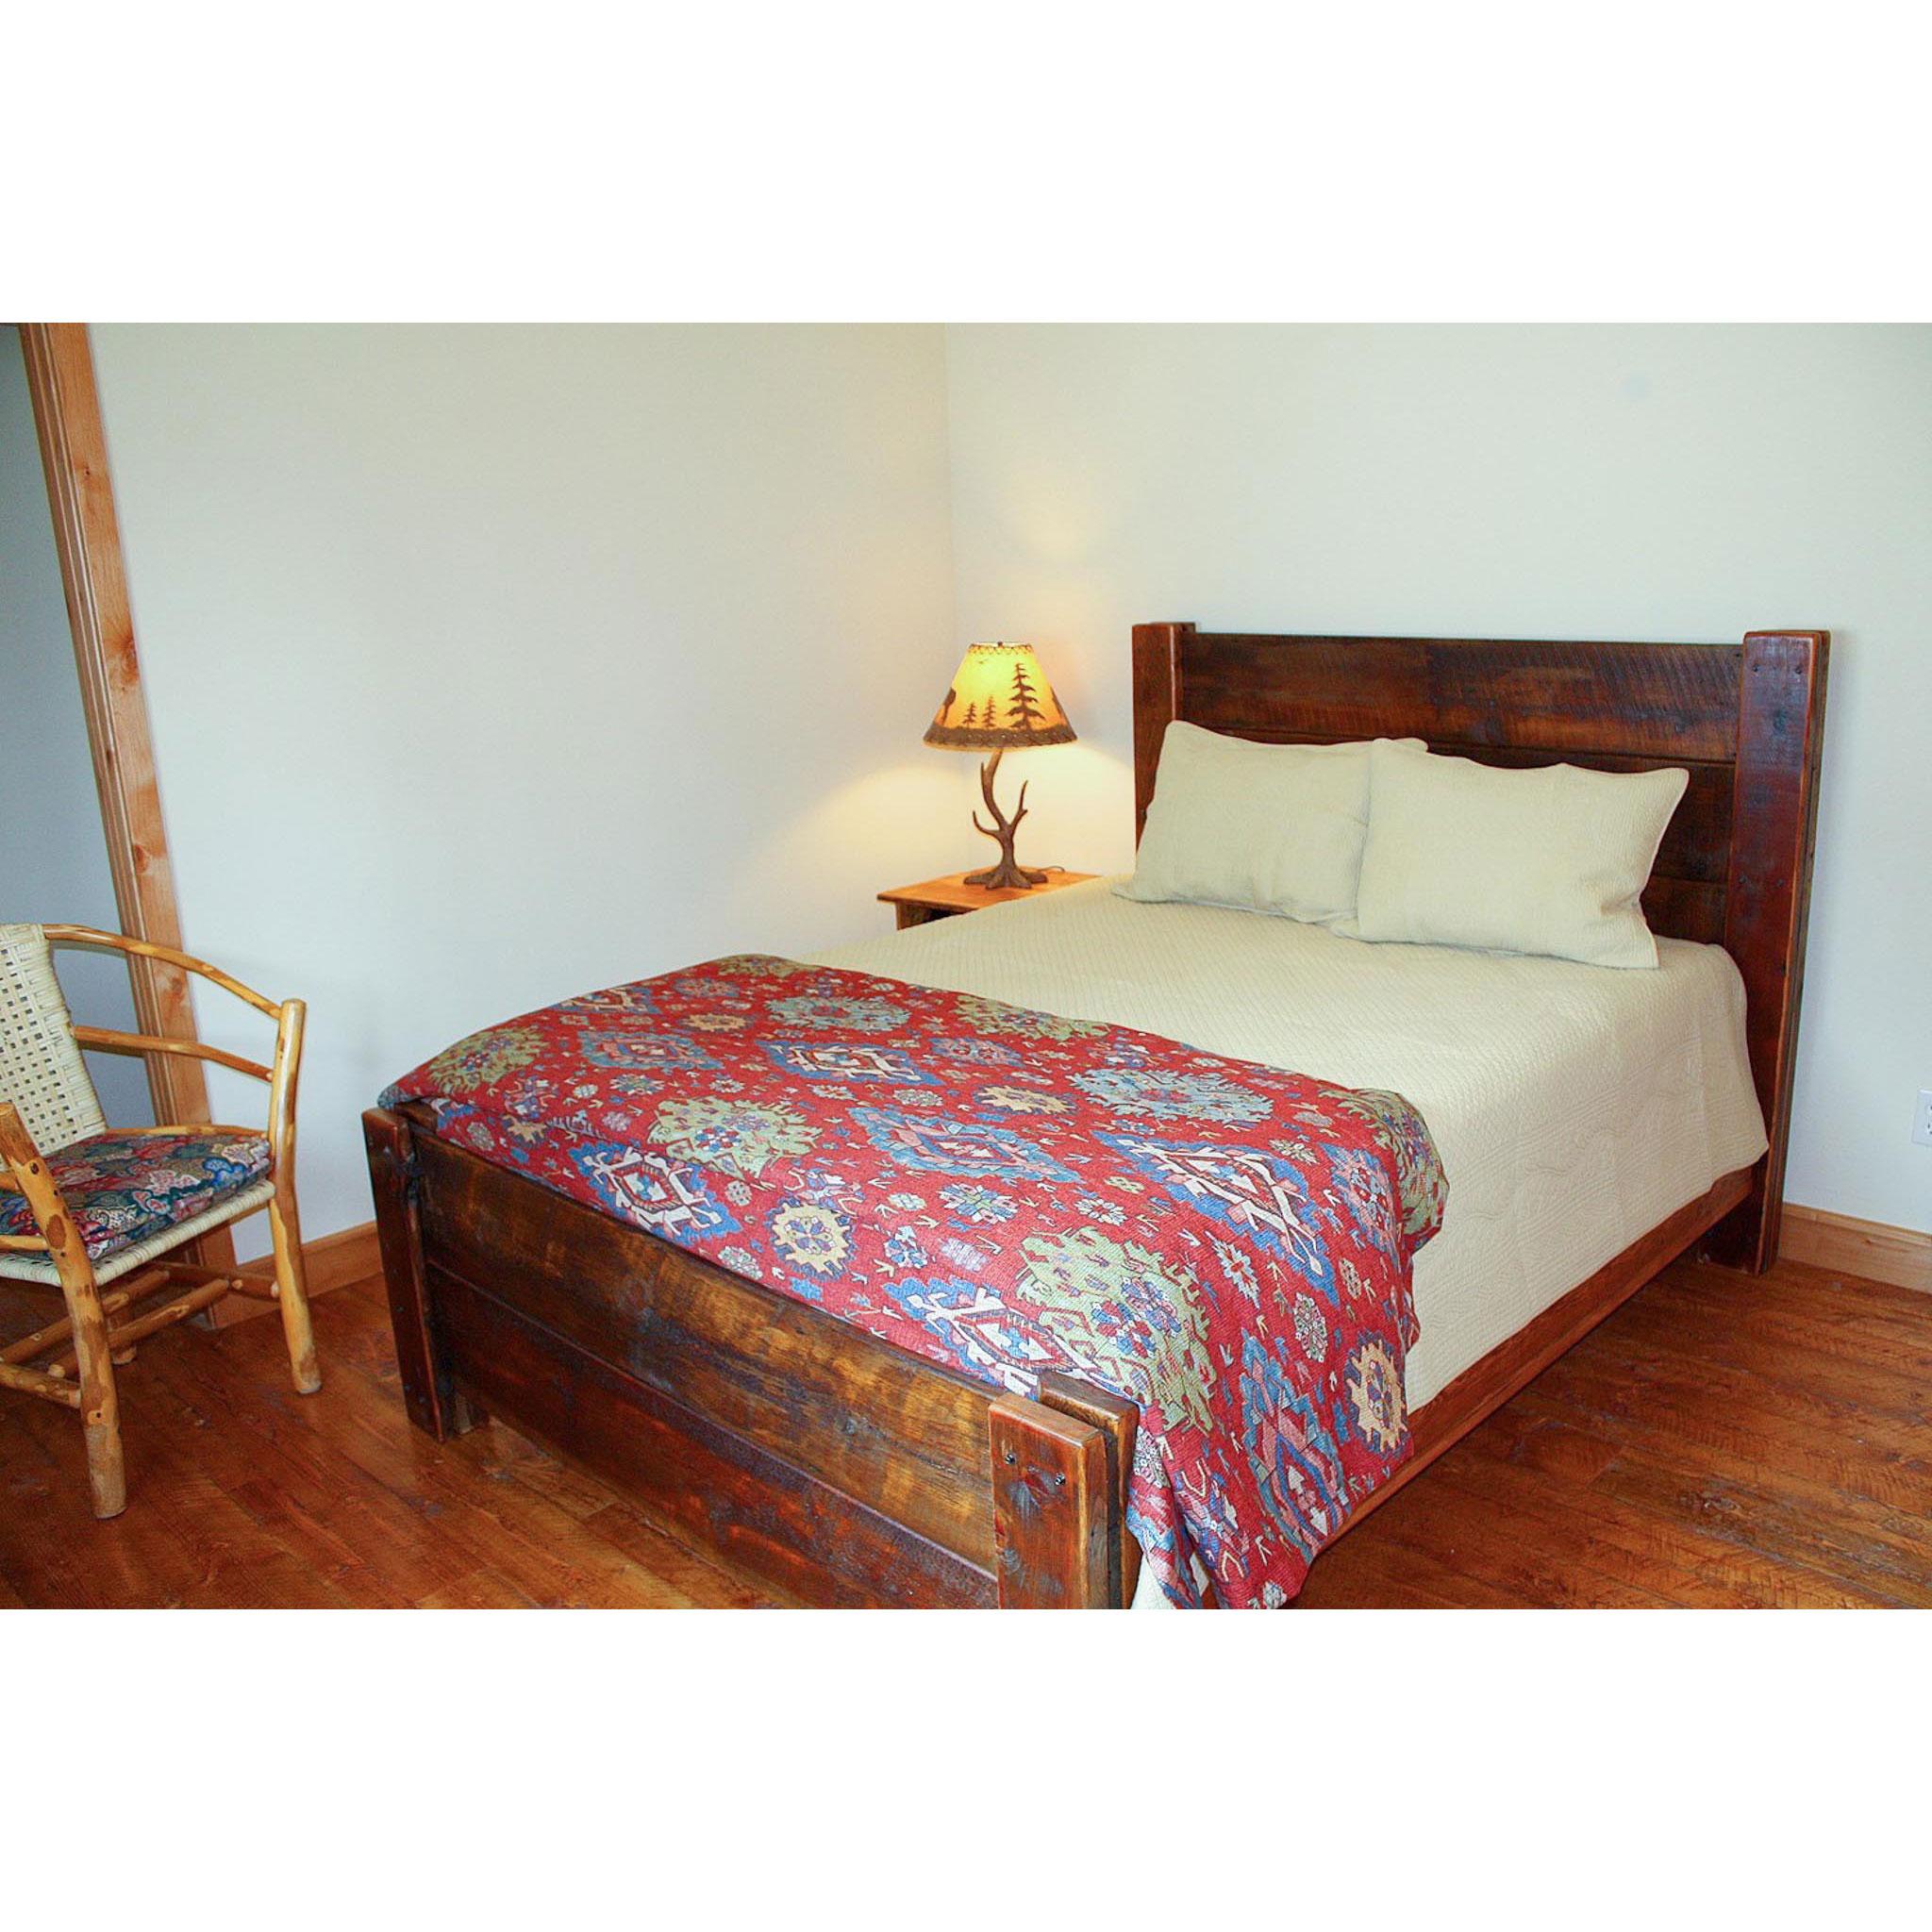 spanish peaks  Straight plank reclaimed bed.